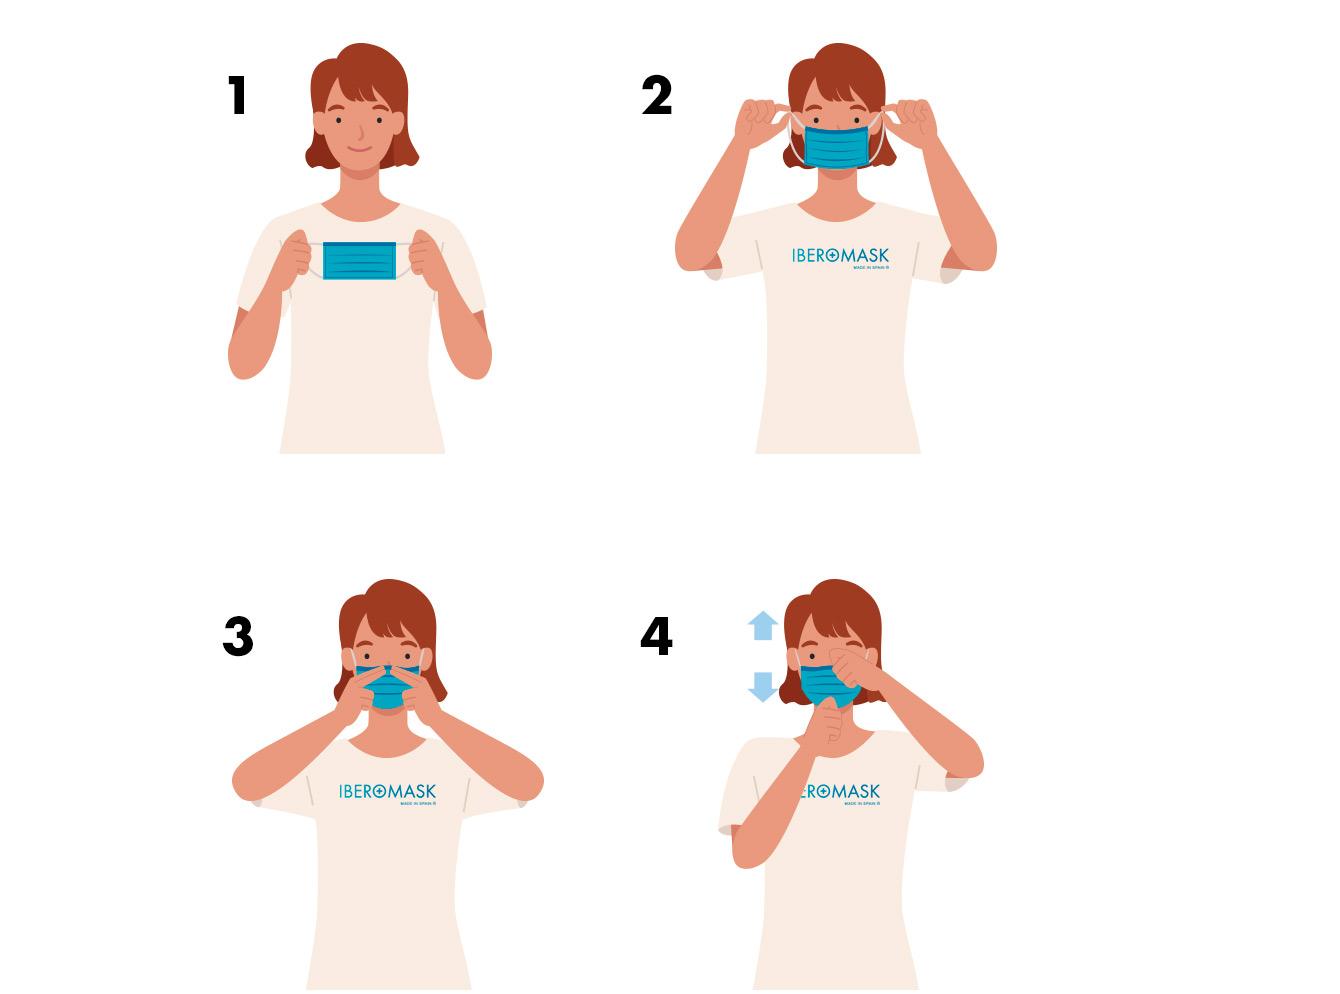 instrucciones como colocase mascarillas higienica iberomask